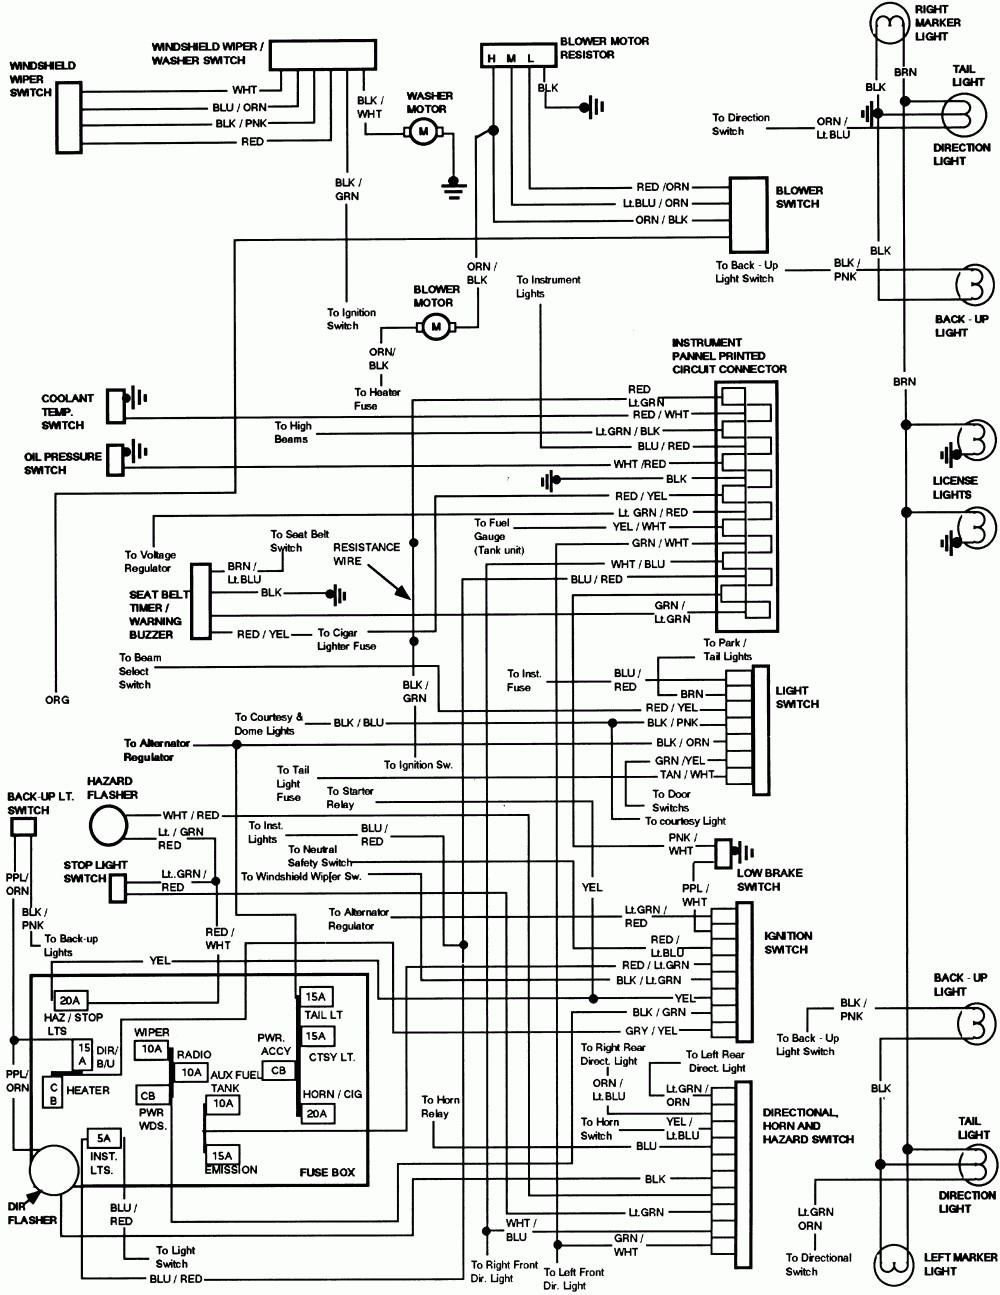 roger vivi ersaks: 2008 F150 Fuel Pump Wiring Diagram